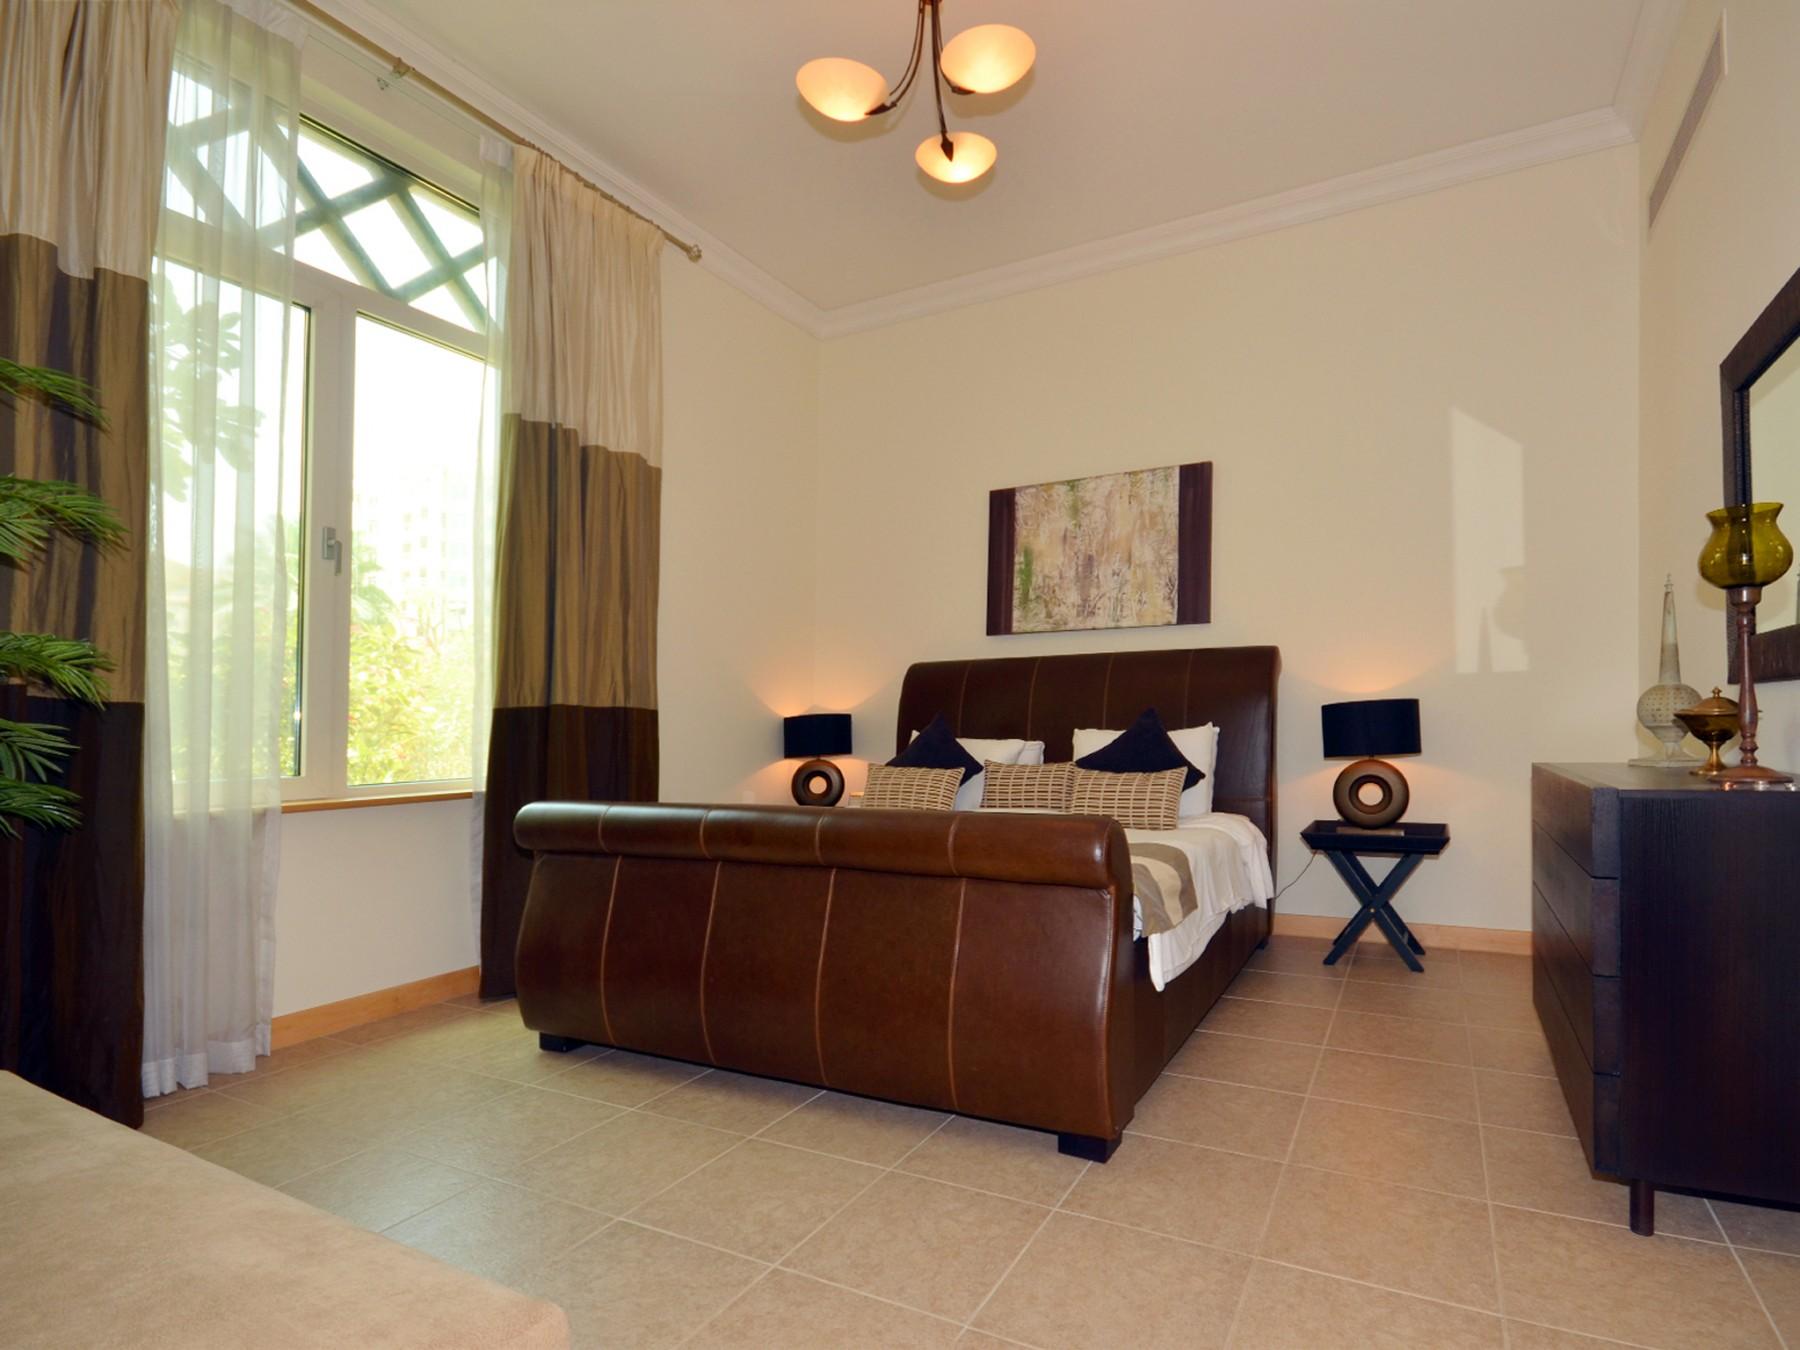 Apartments In Dubai 2 Bedroom Dubai Rental With Children S Play Area